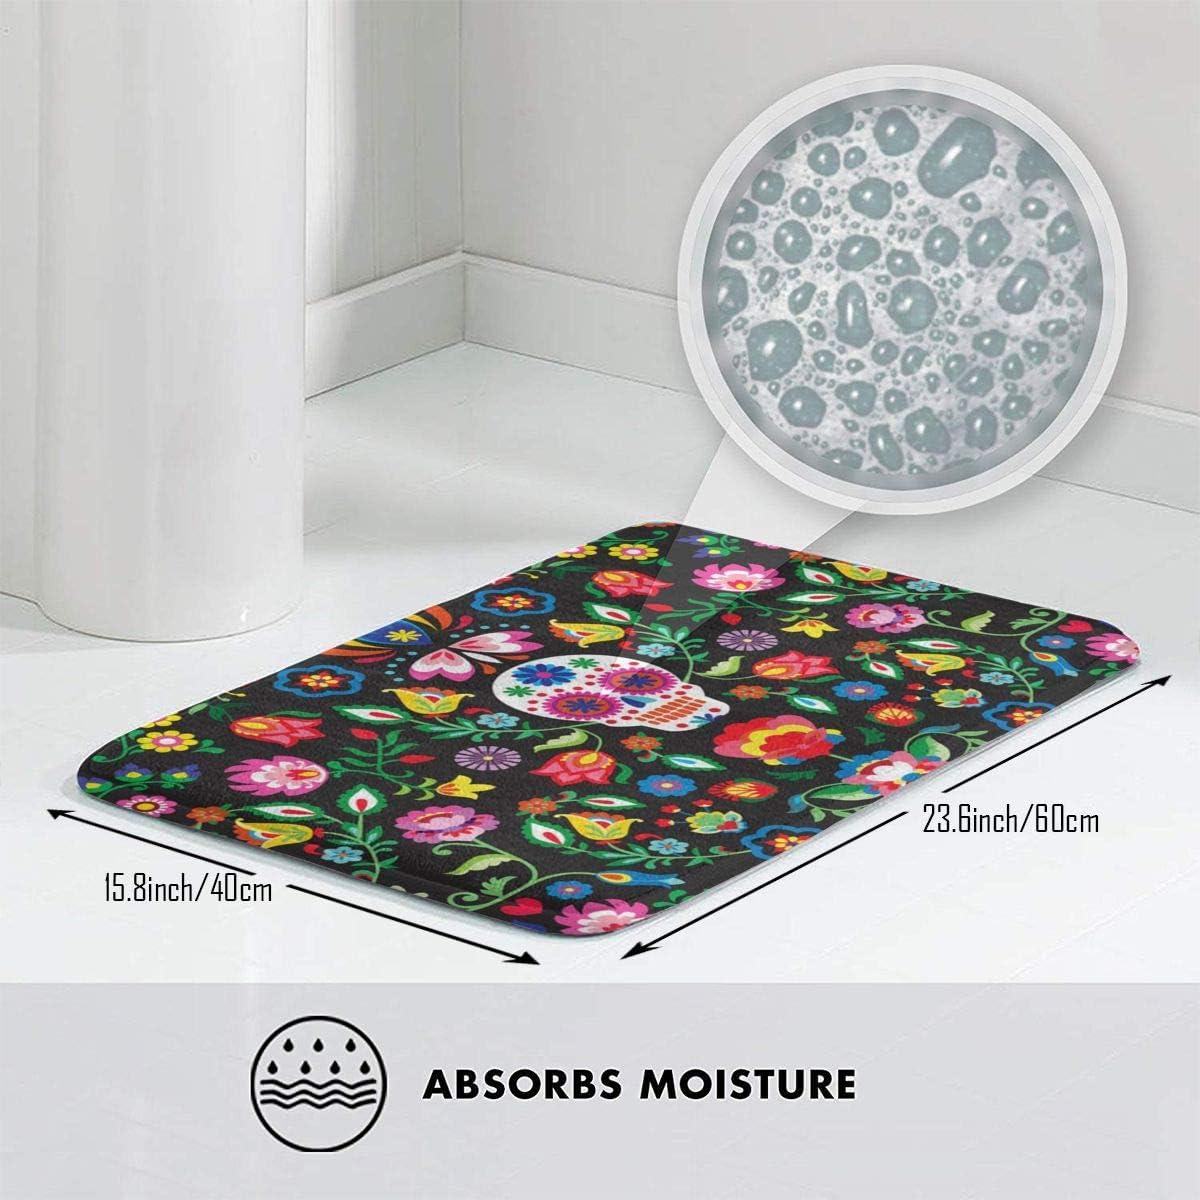 S Non Slip Decor Bathroom Mats Day Of The Dead Sugarkull Girl Print Non Slip Rubber Kitchen Rugs 40cm X 60cm